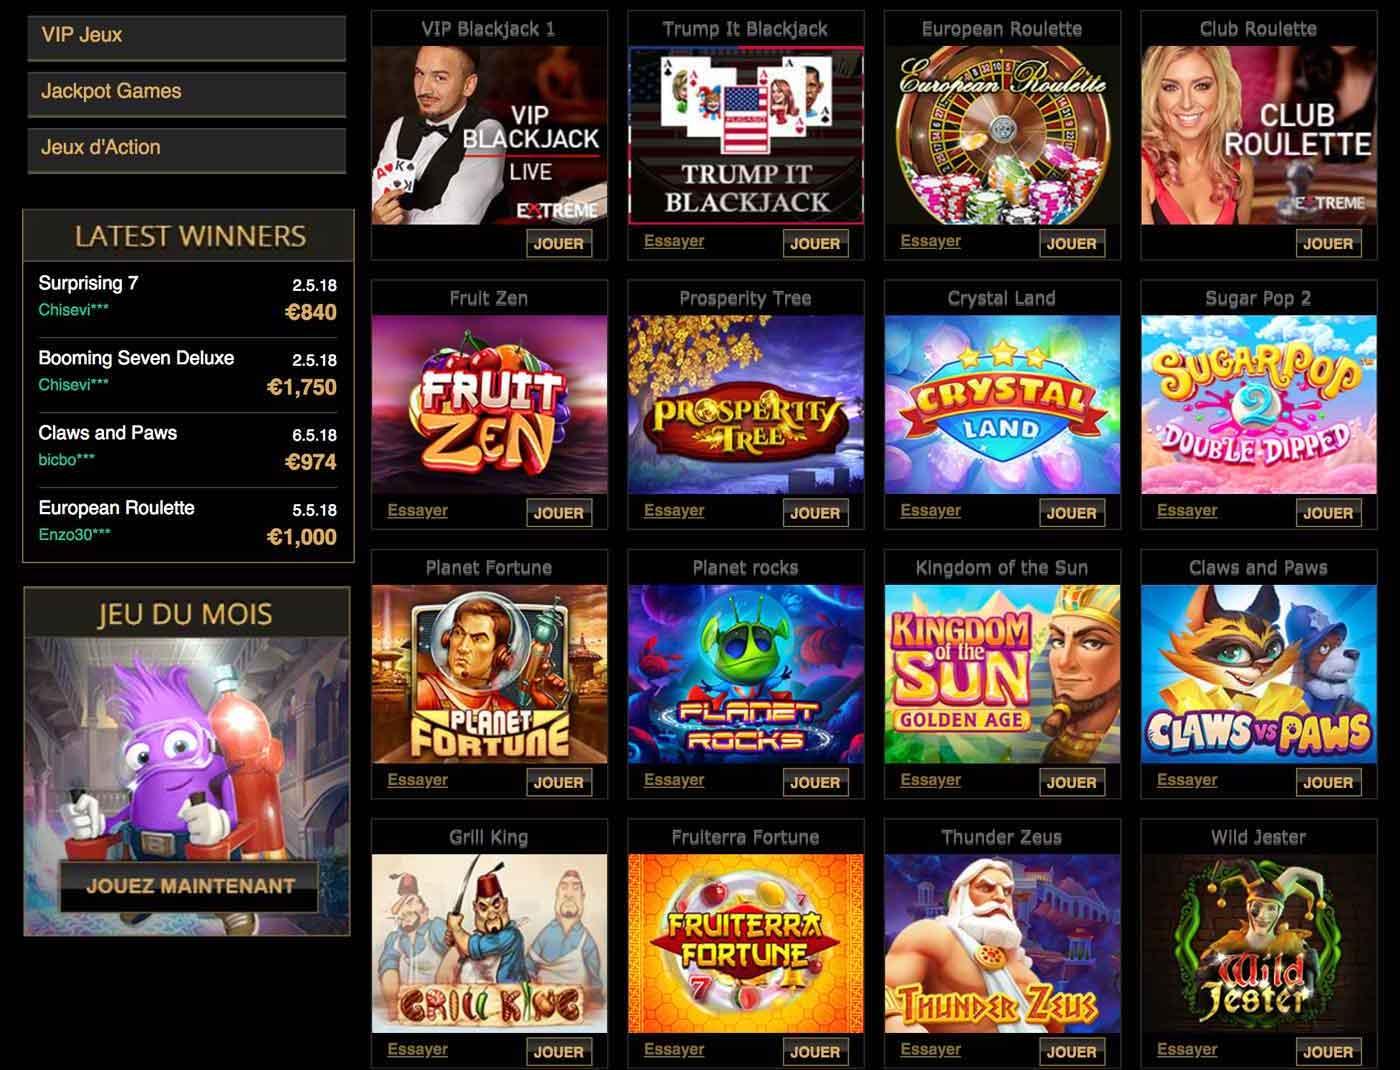 Jeux joka casino : que propose Joka casino comme jeu ?